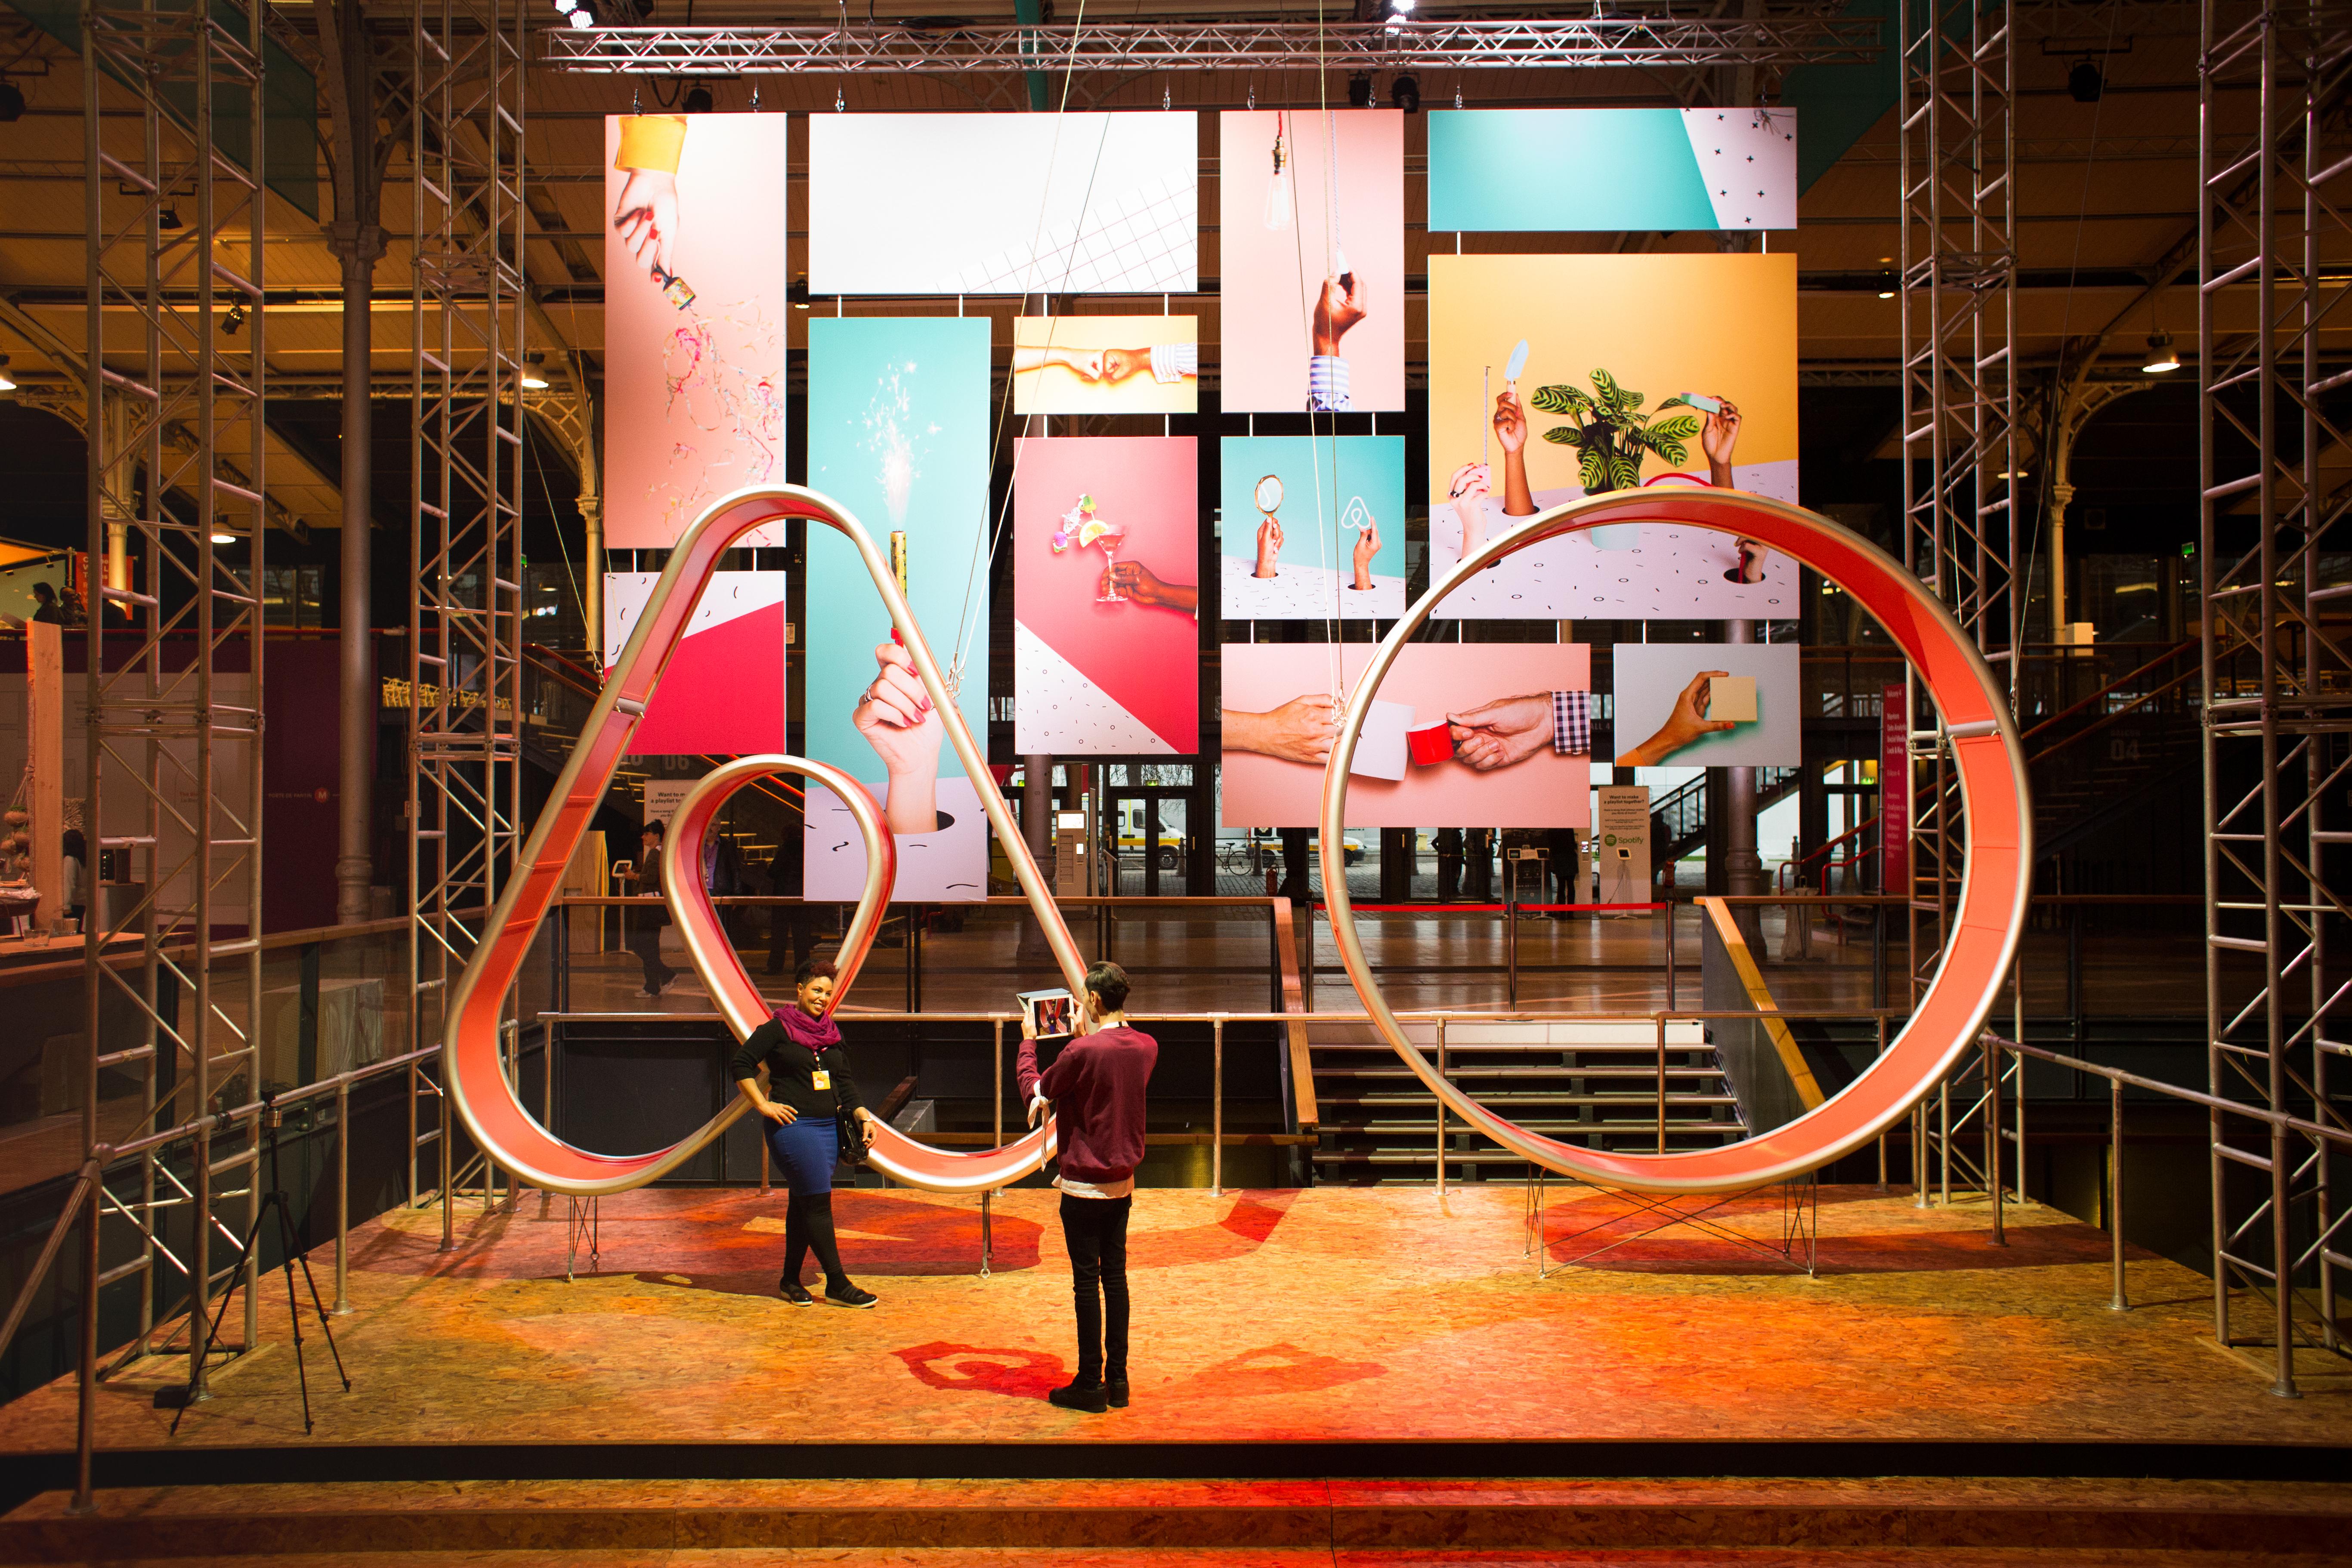 Airbnb internal